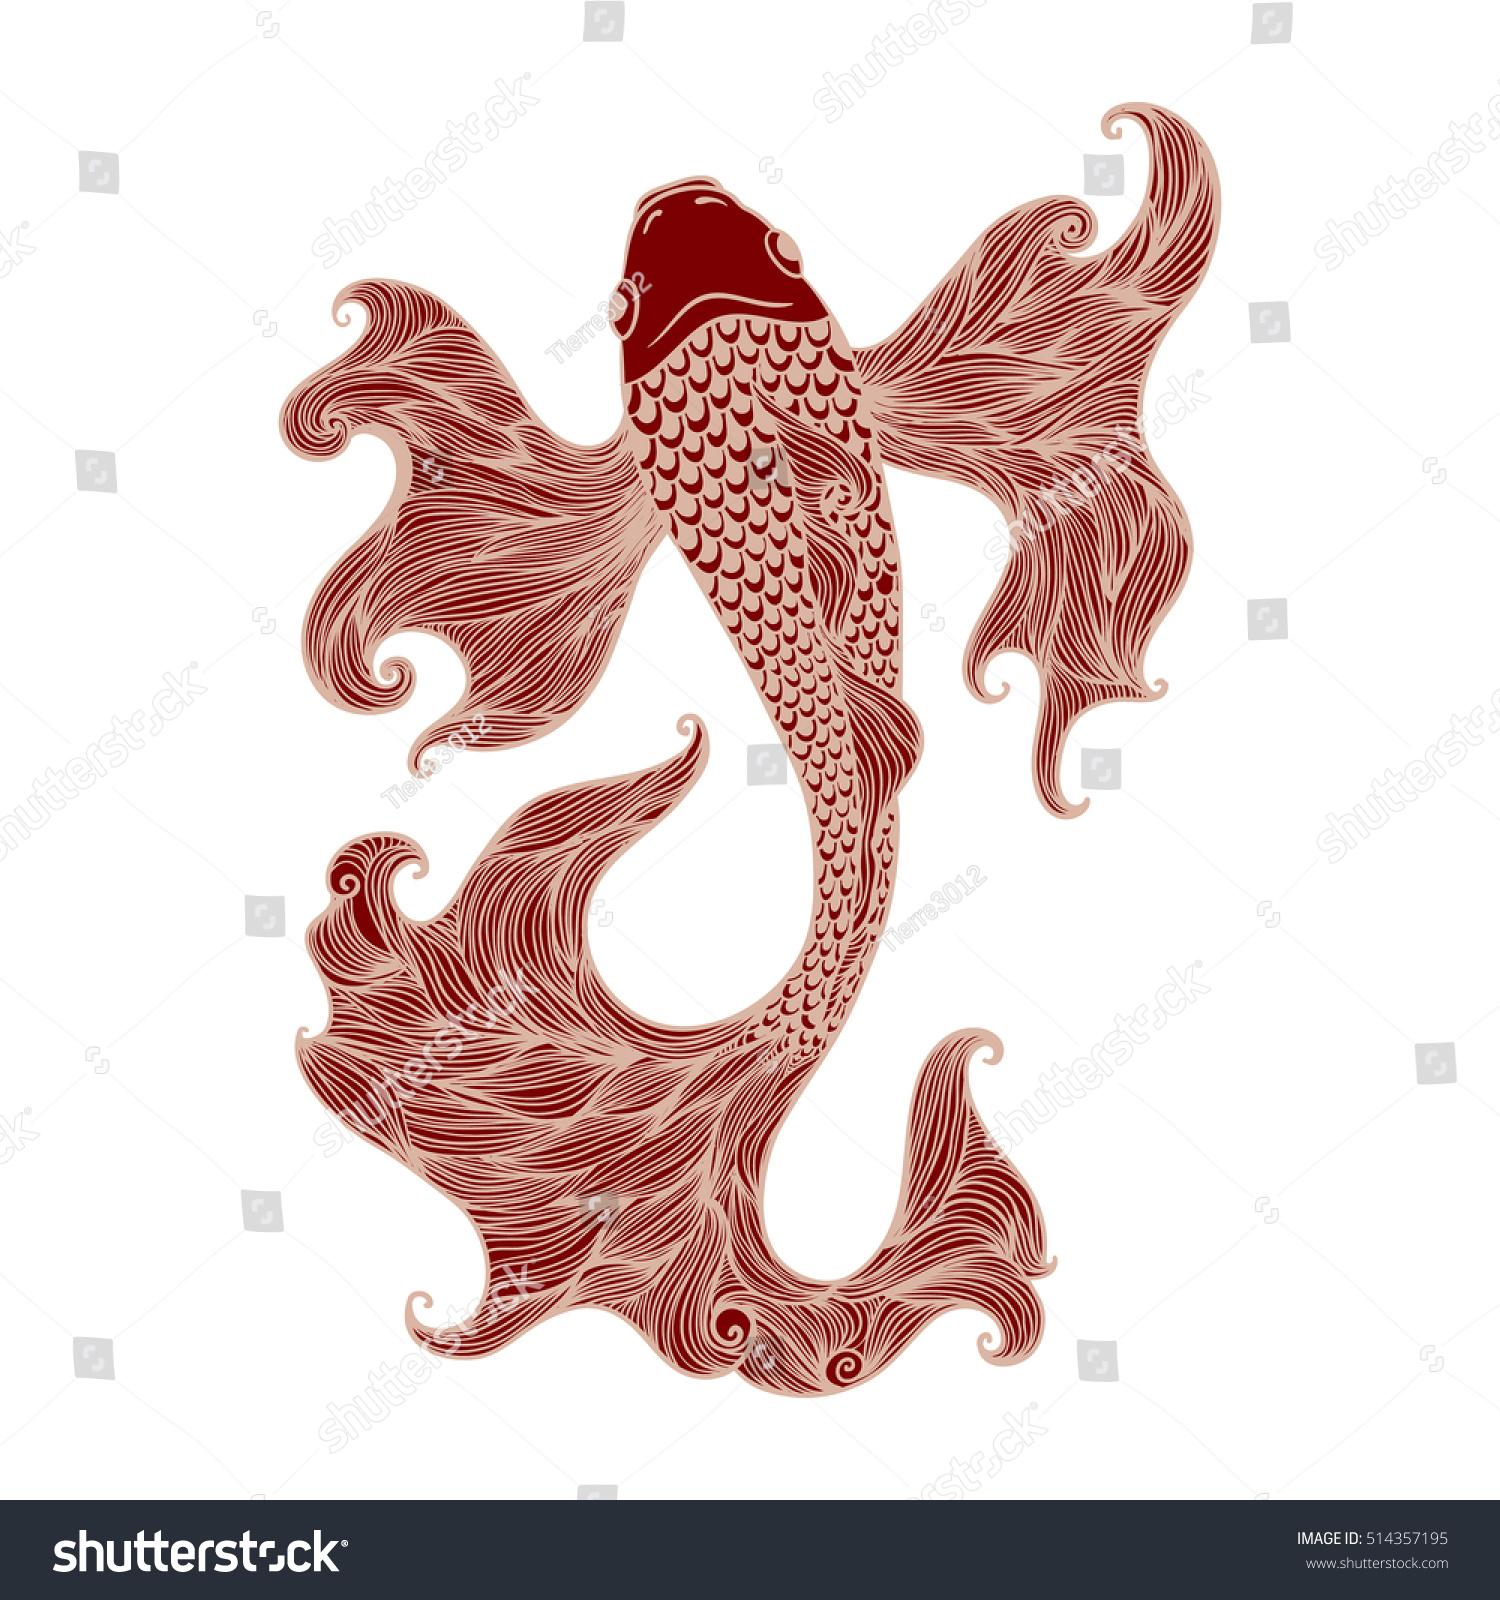 Hand Drawn Fish Koi Carp Zentangle Stock Vector HD (Royalty Free ...